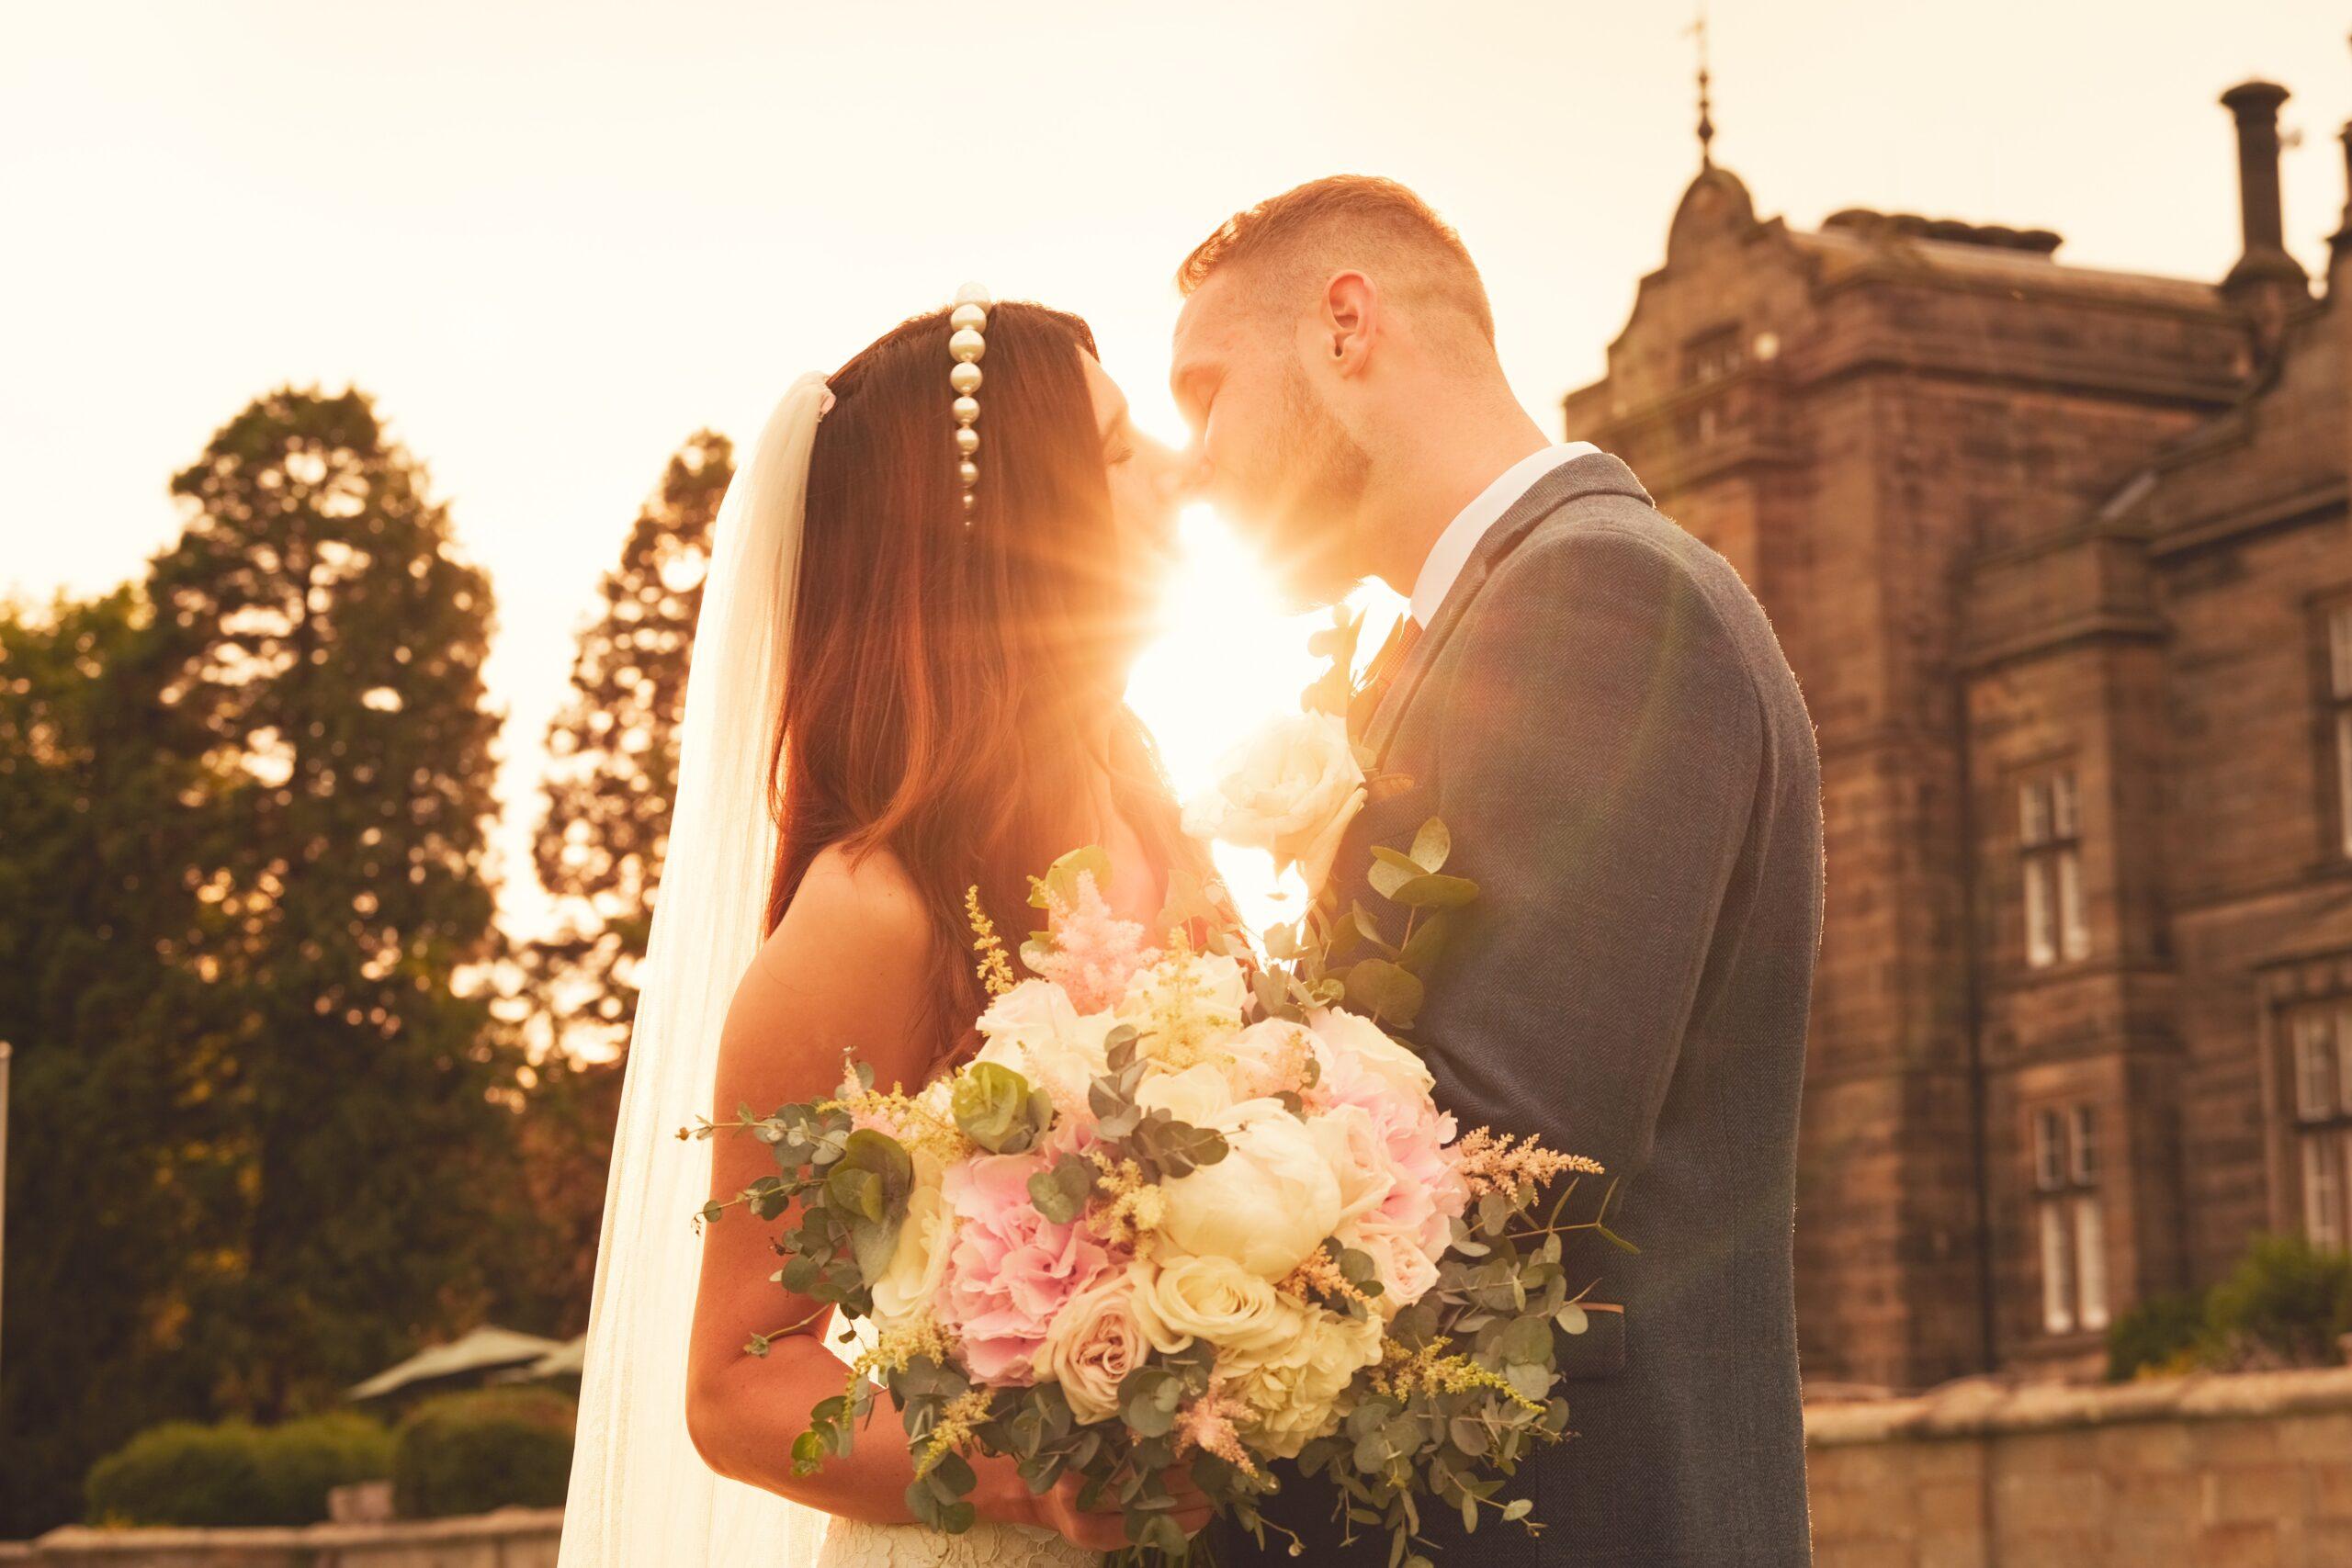 Rebecca and Simon's Intimate Wedding Affair at Matfen Hall